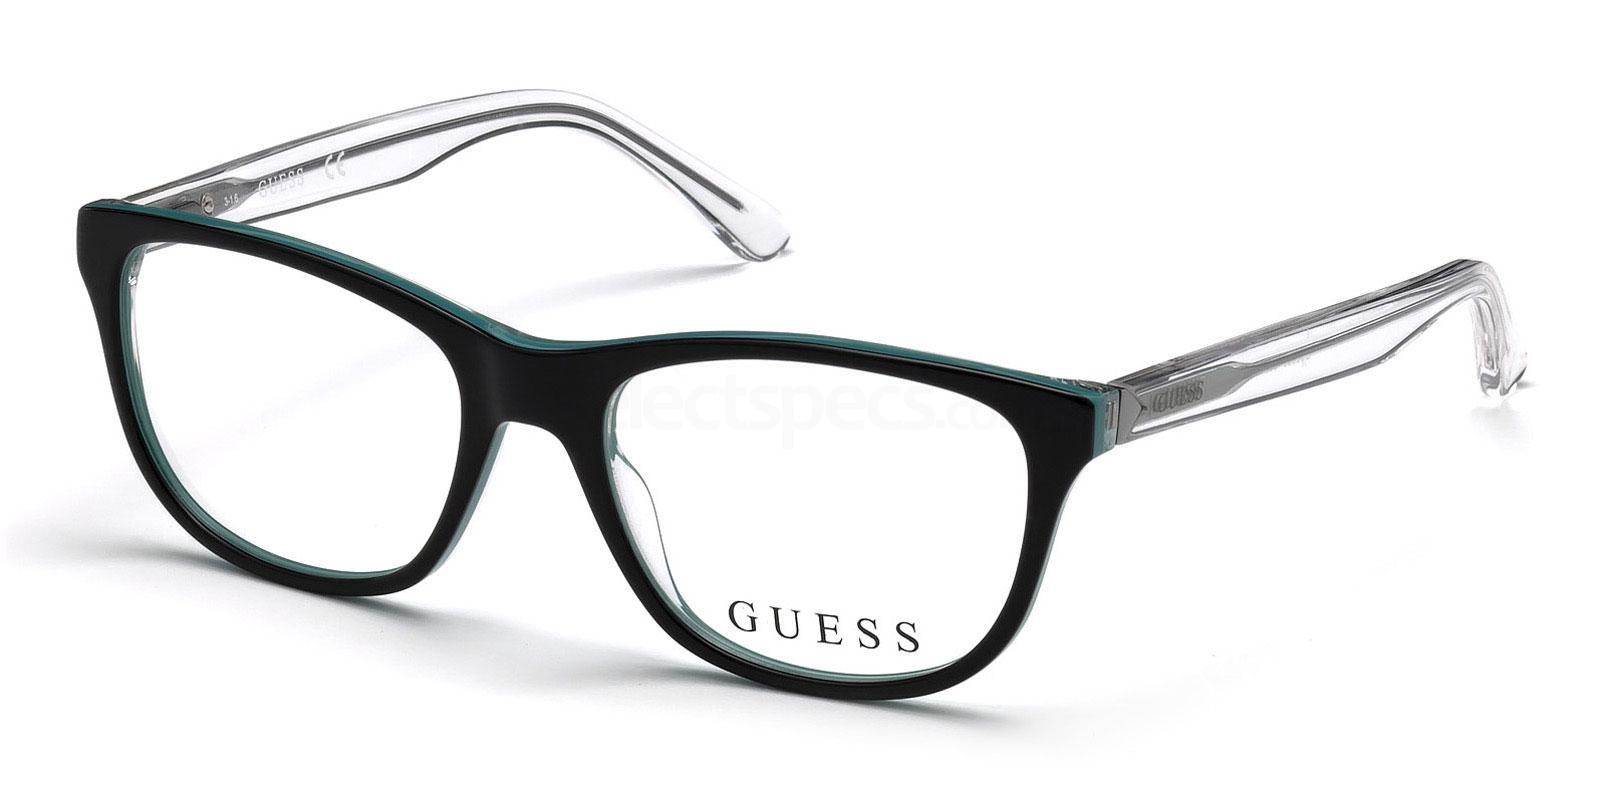 005 GU2585 Glasses, Guess